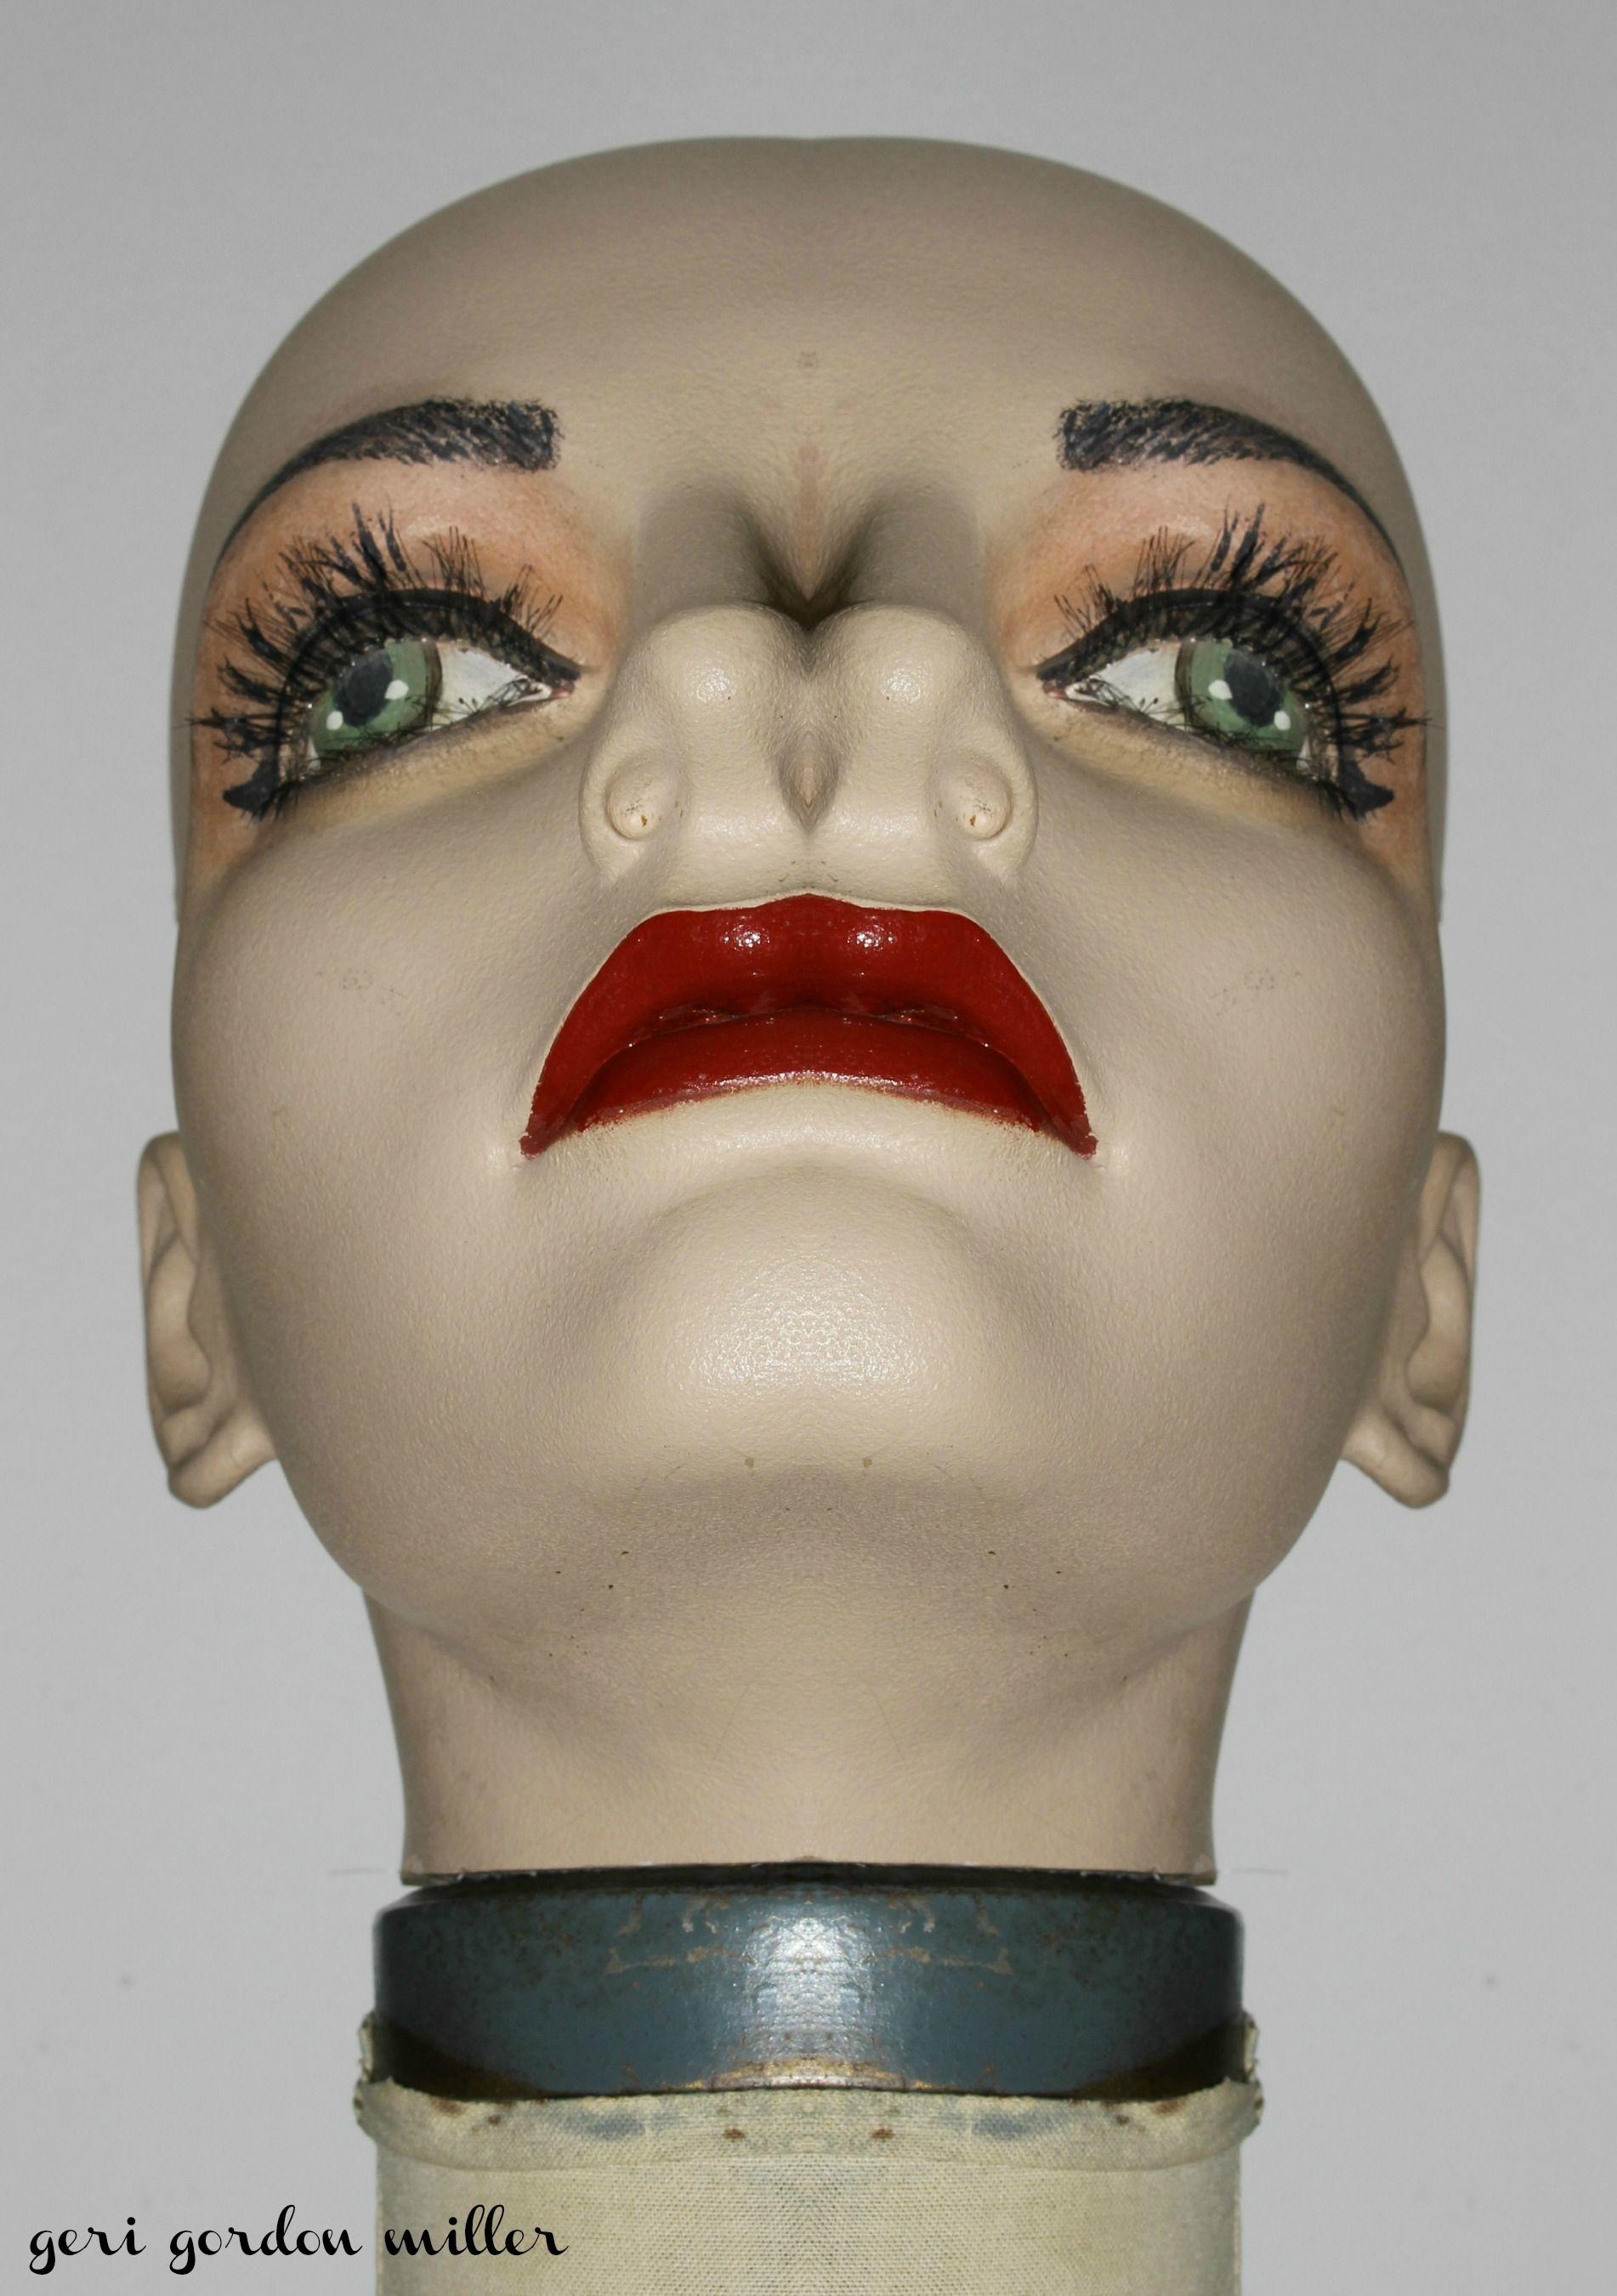 #2Noses #MannequinHead #VintageMannequin